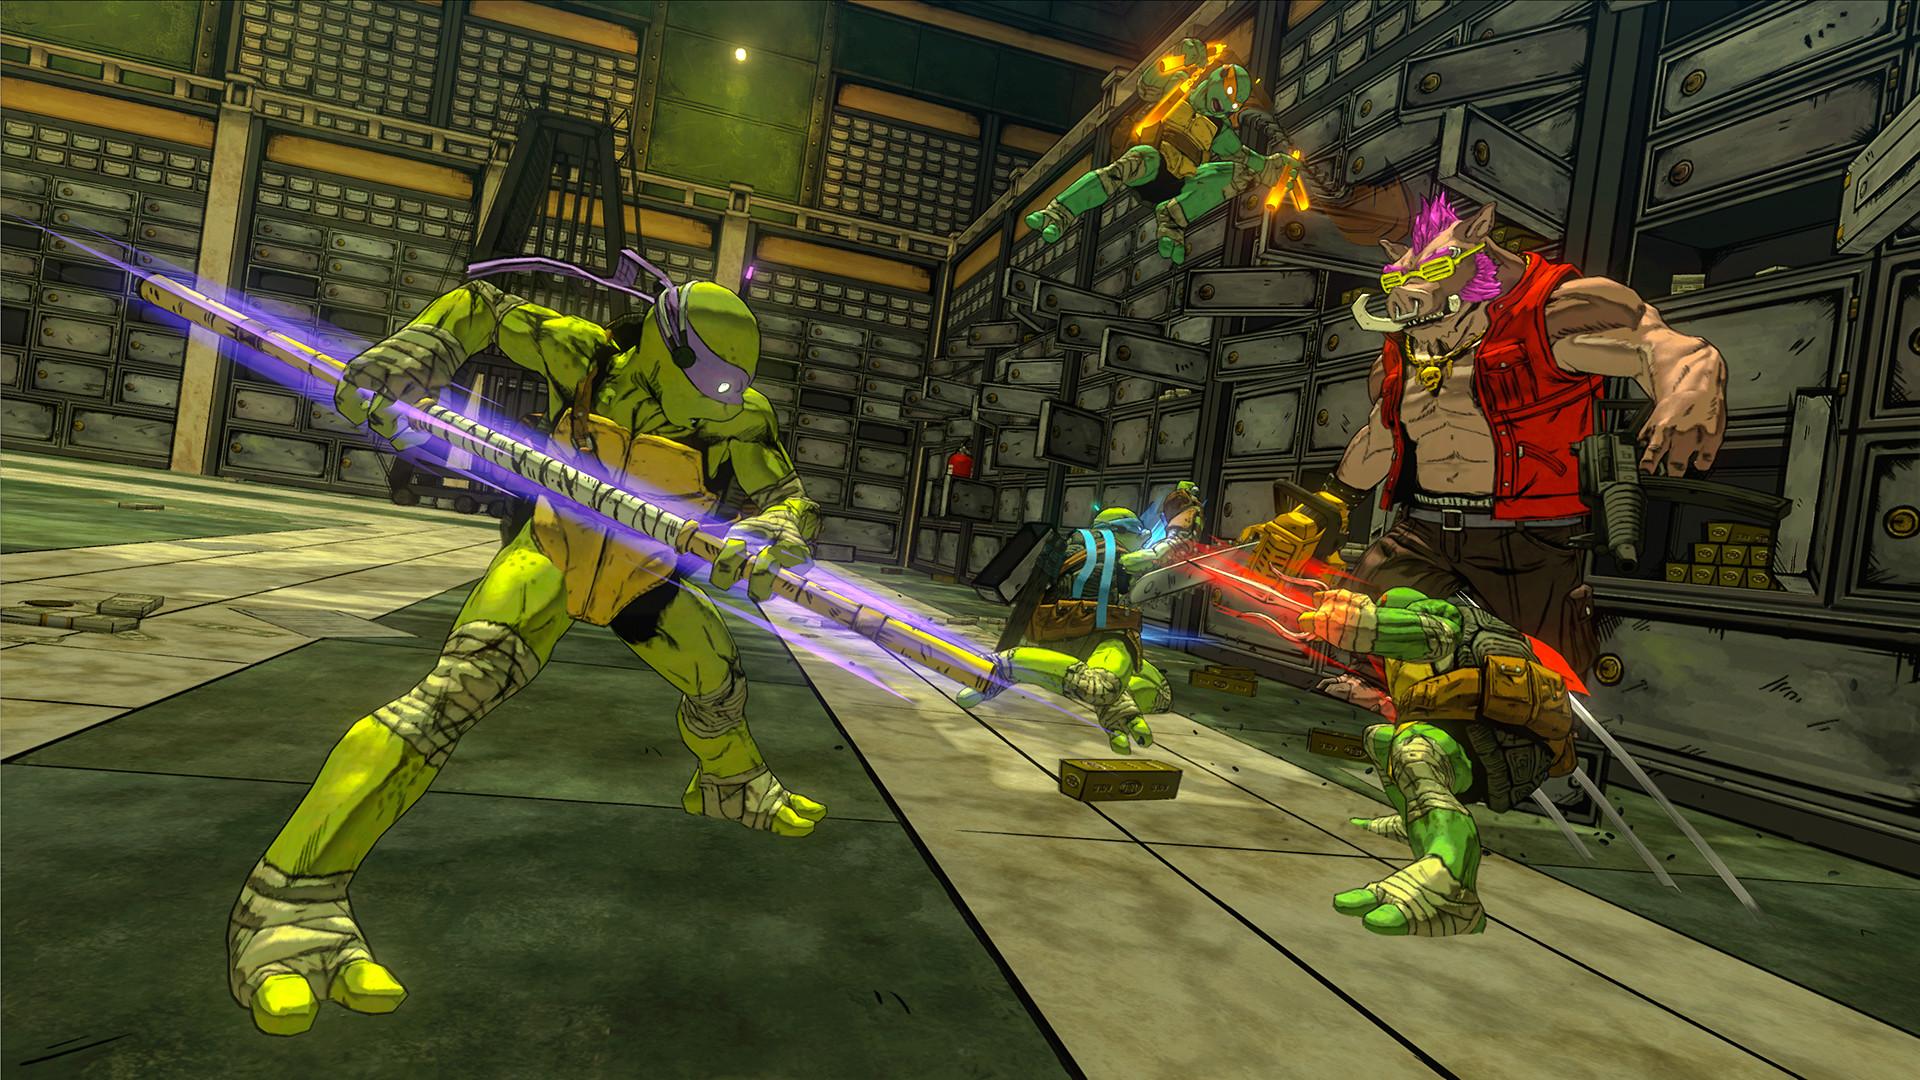 Teenage Mutant Ninja Turtles Mutants In Manhattan ESPAÑOL PC Full (CODEX) + REPACK 2 DVD5 (JPW) 9